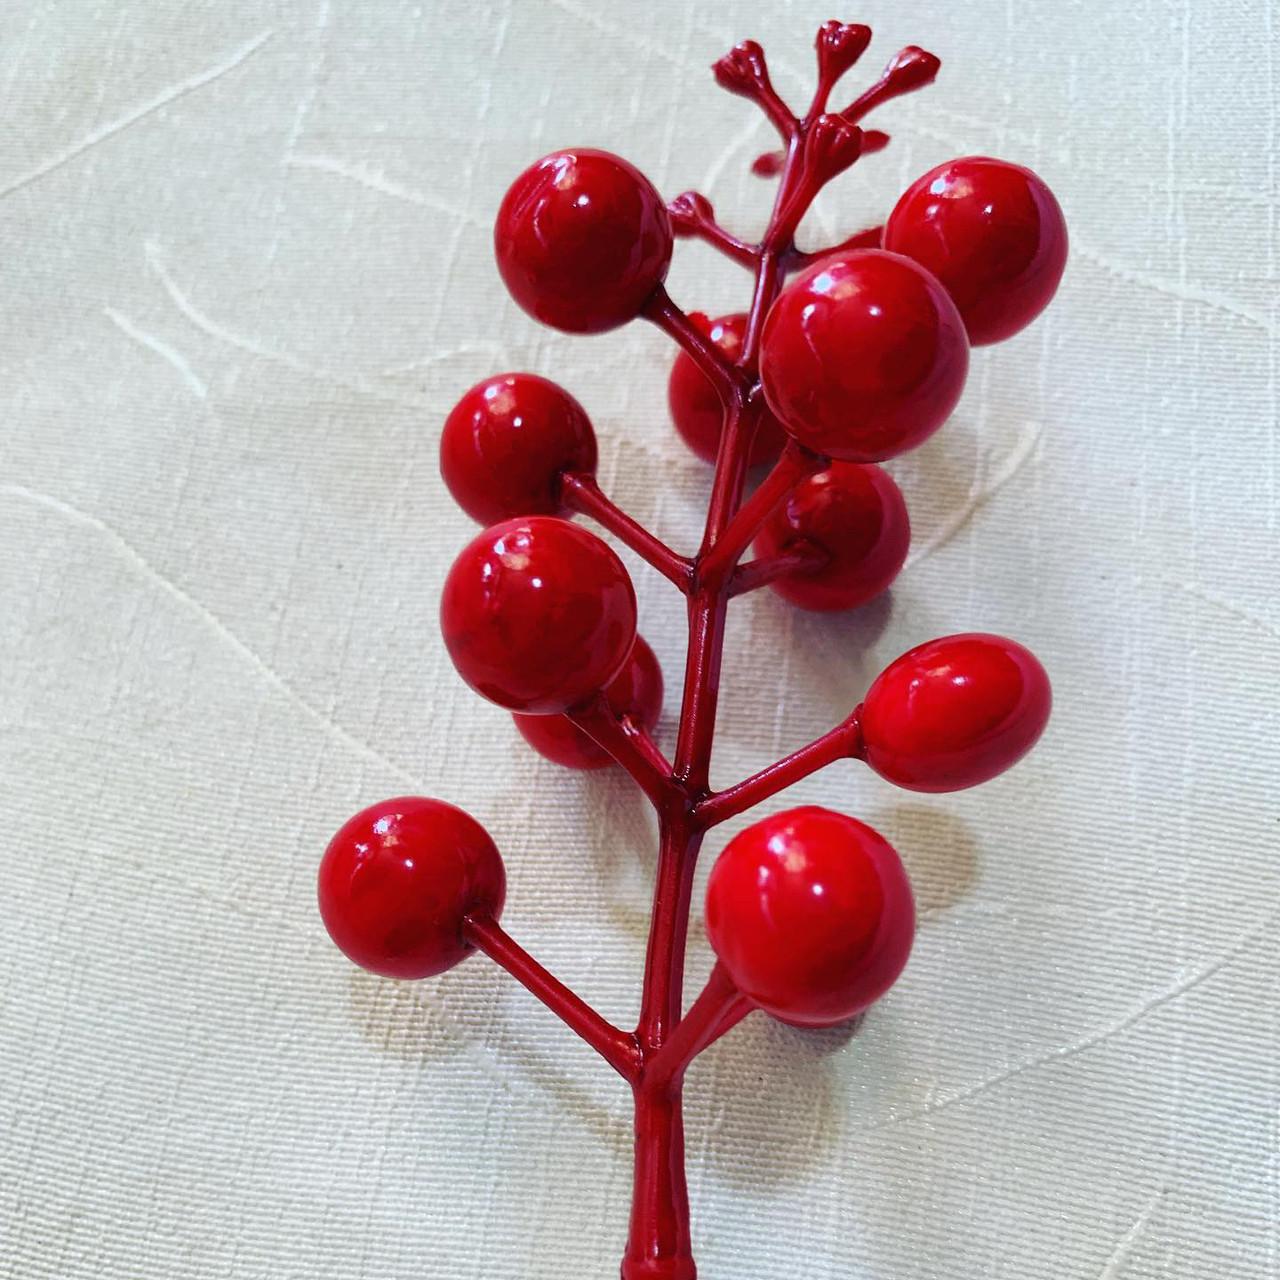 Декоративная насадка-ягода красная.